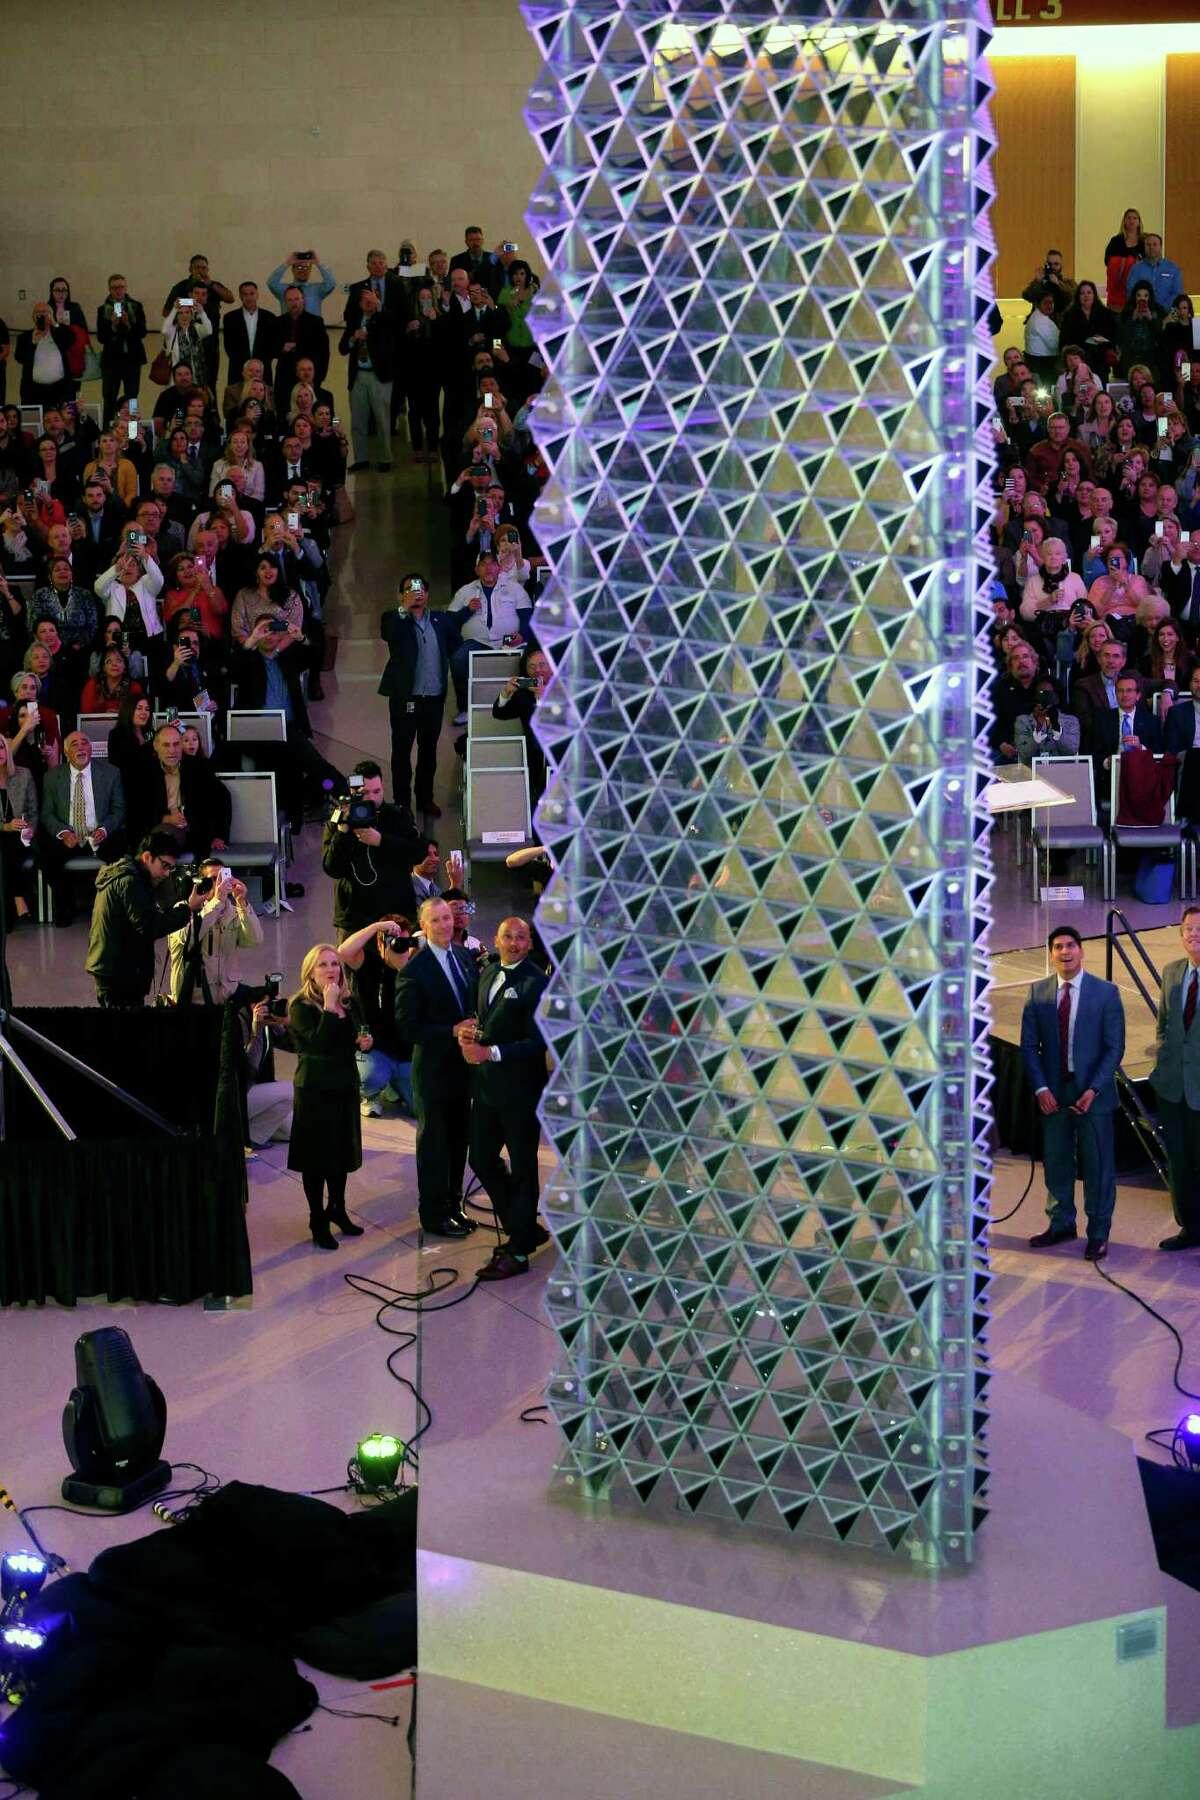 2. The 30-foot-tall art installation